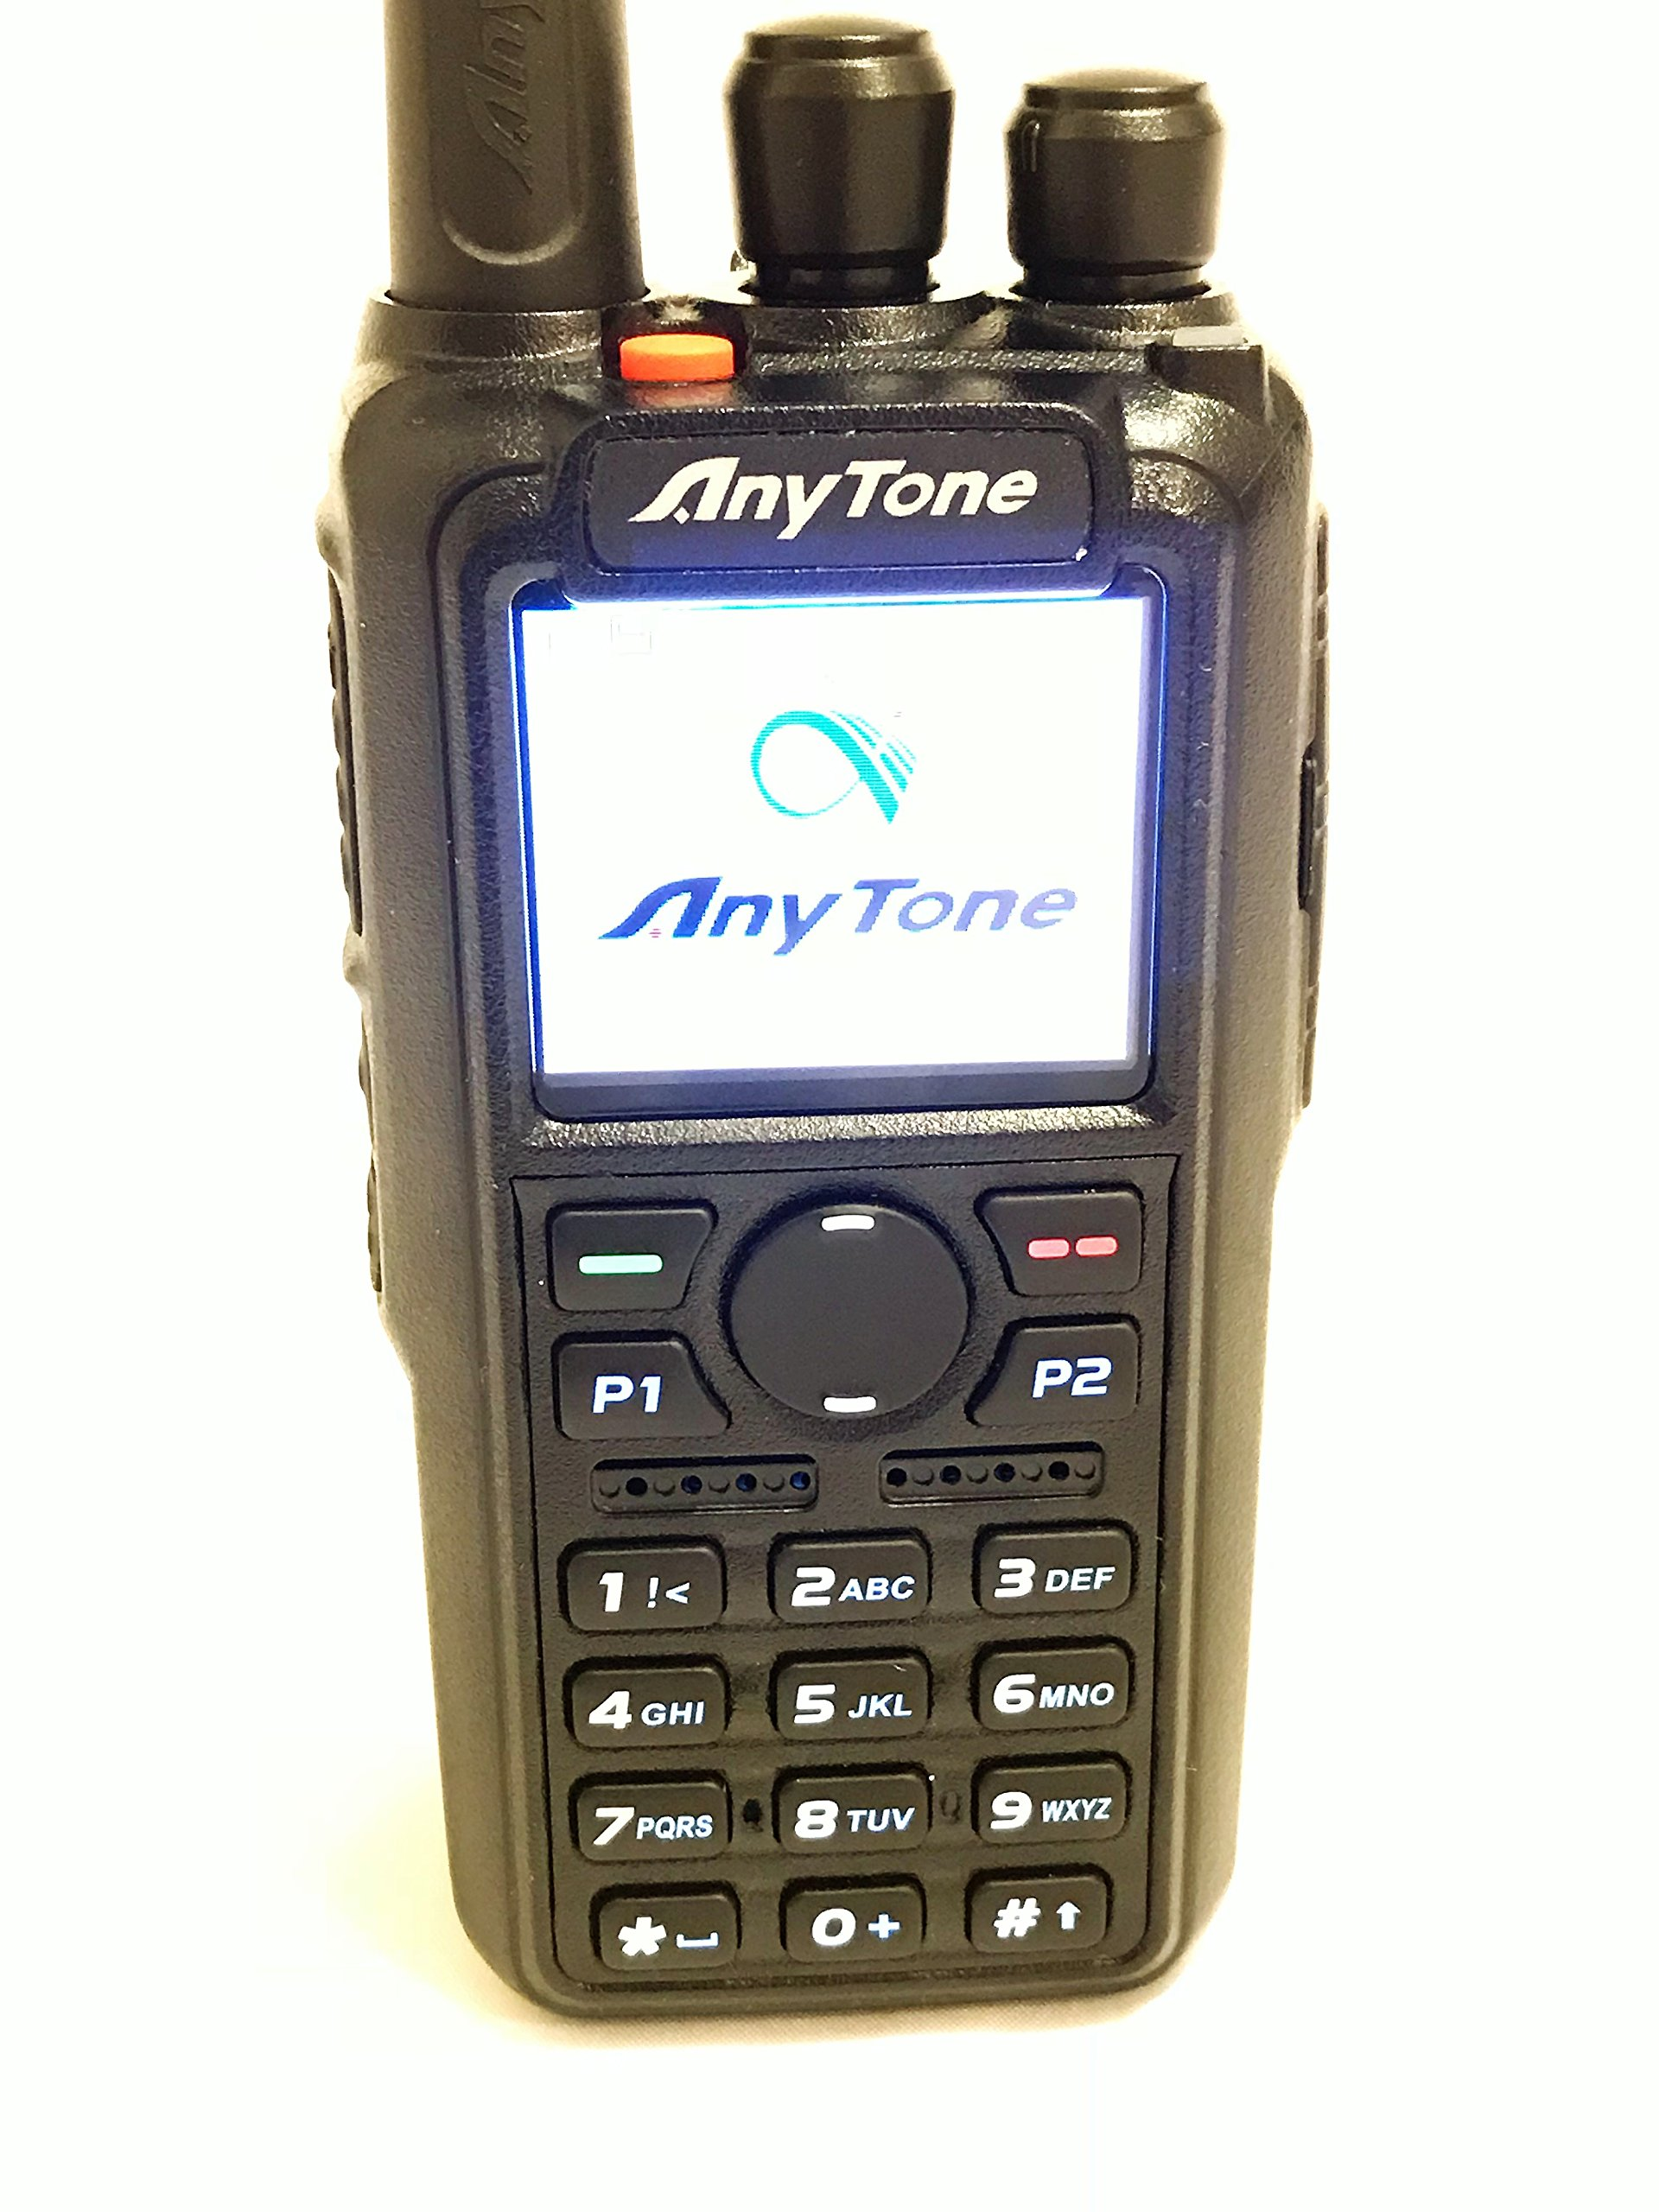 AnyTone AT-D868UV GPS Version II Upgraded 3100mAh battery Dual Band DMR/Analog 144 & 430 MHz Radio US Seller by AnyTone (Image #2)